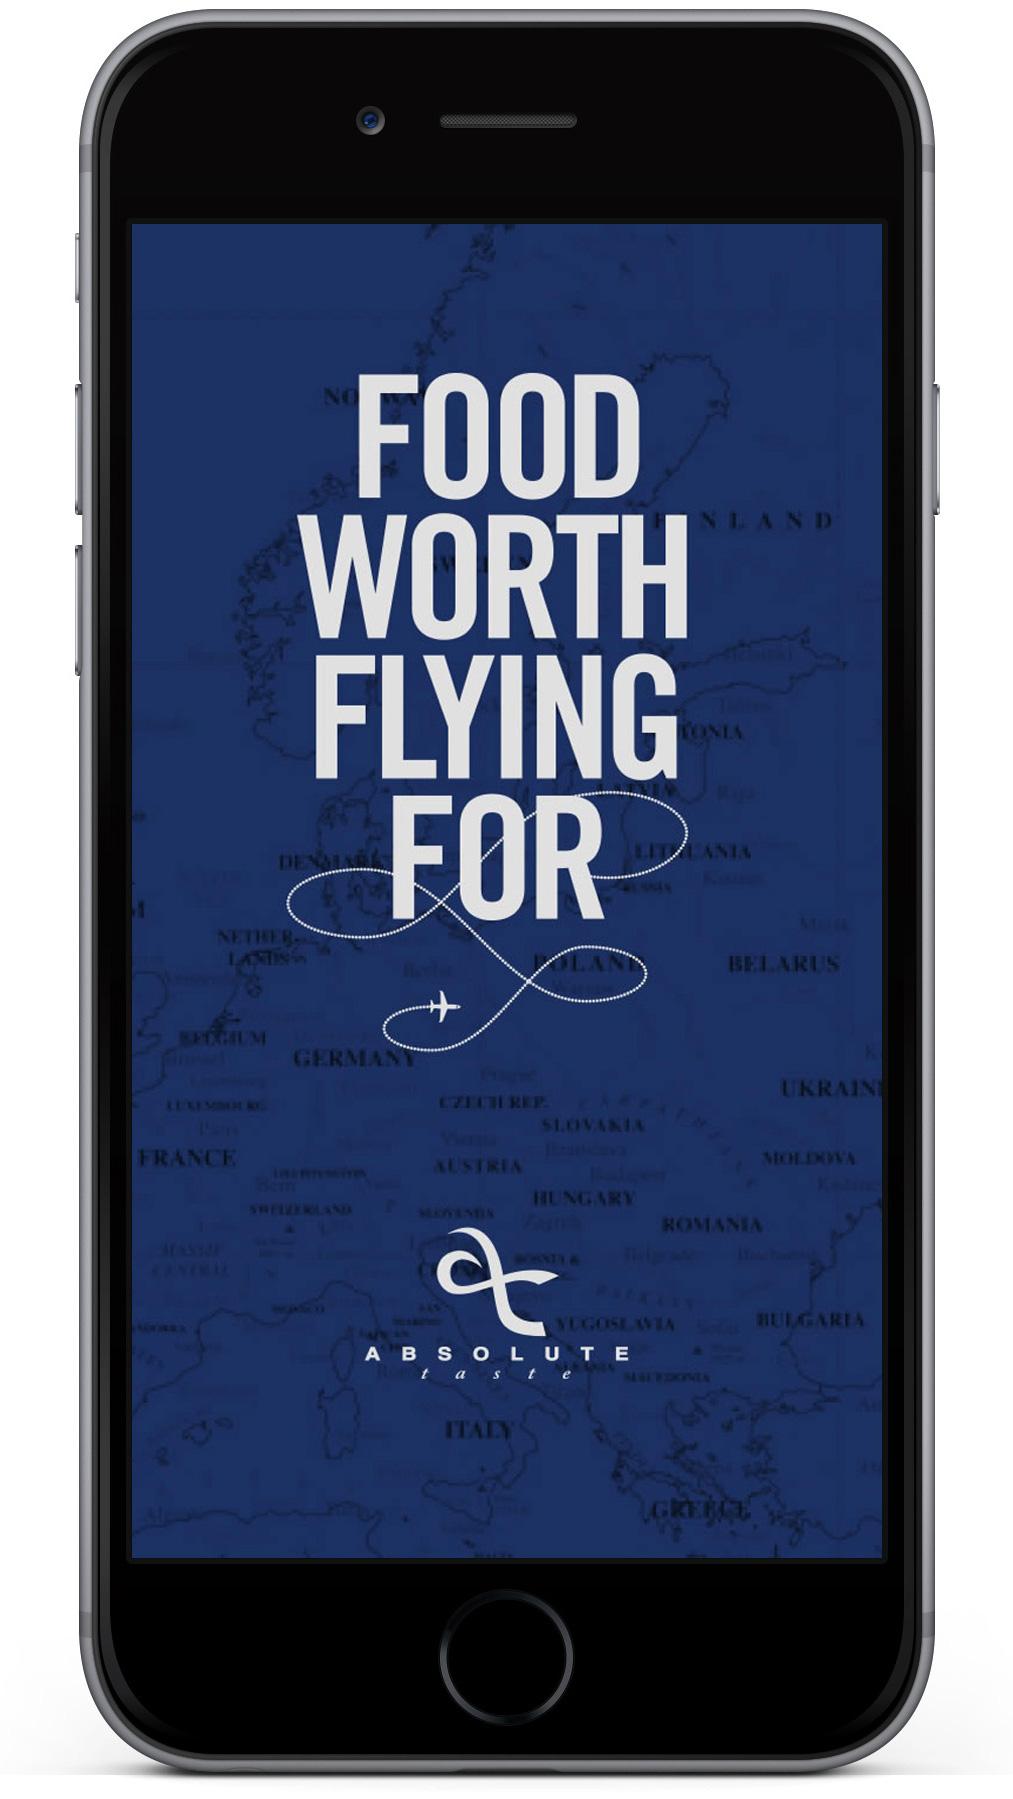 Absolute Taste app splash page design on mobile